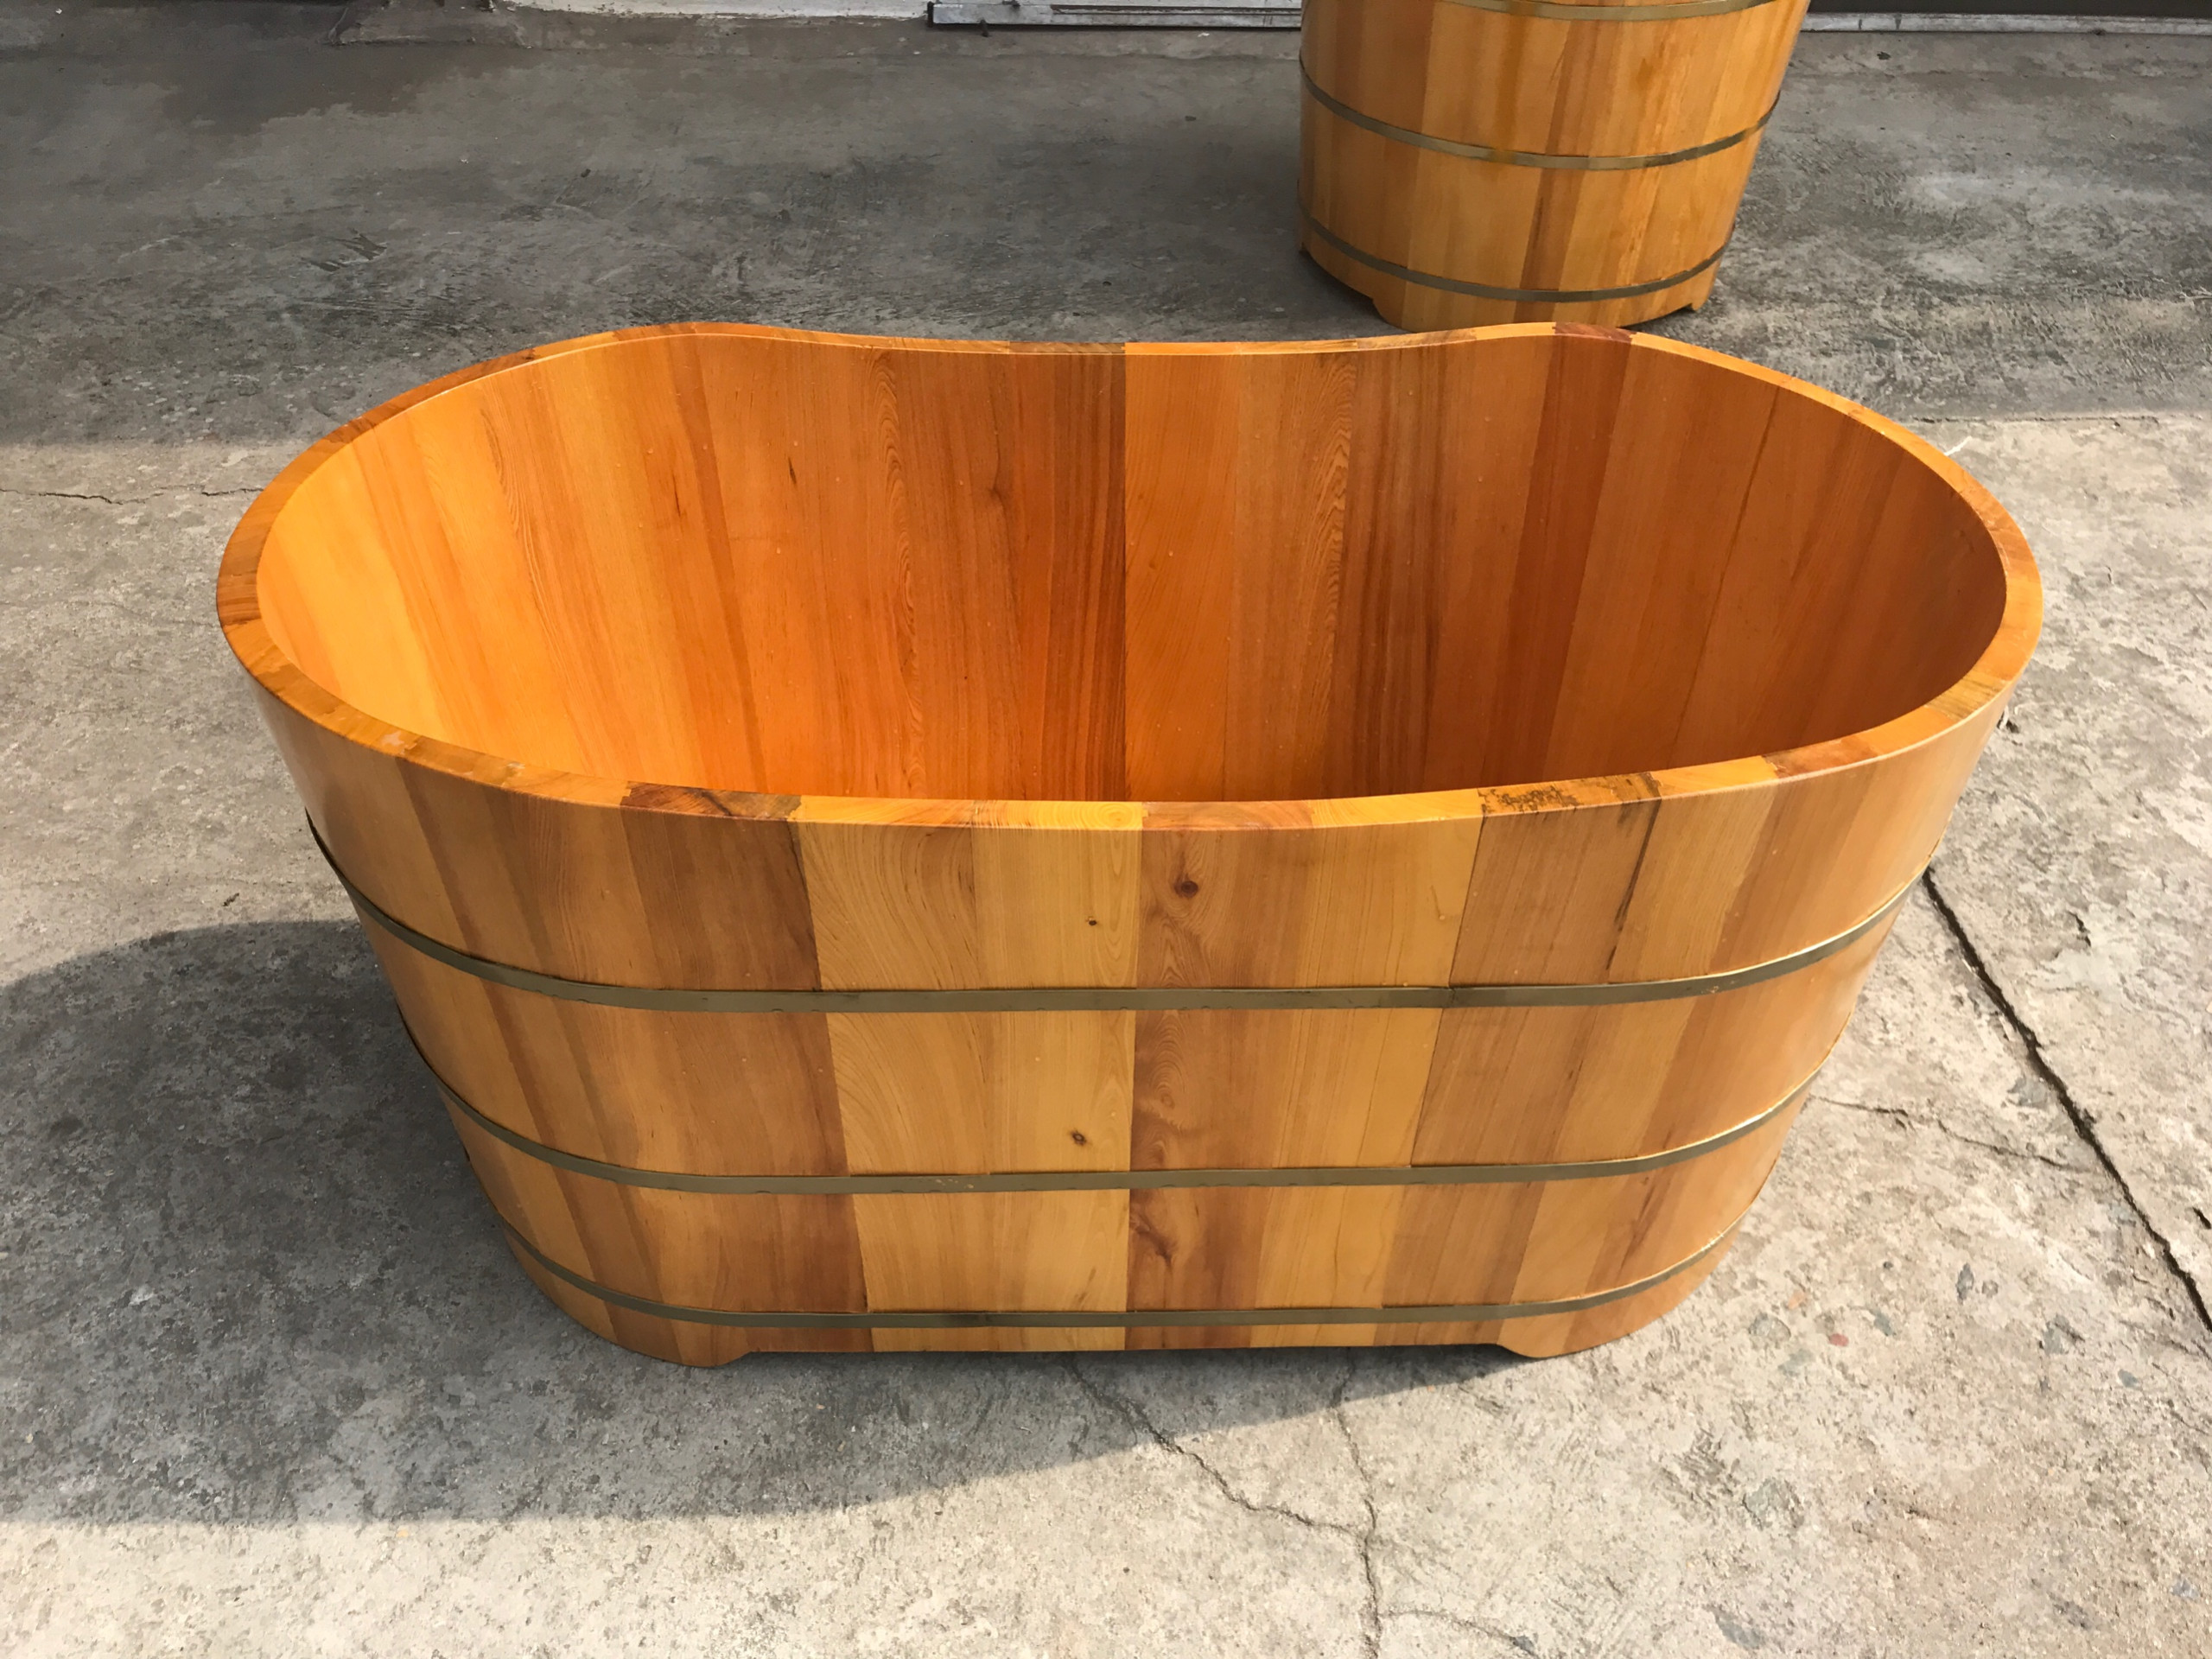 Bồn tắm gỗ pơmu, bồn tắm gỗ giá rẻ